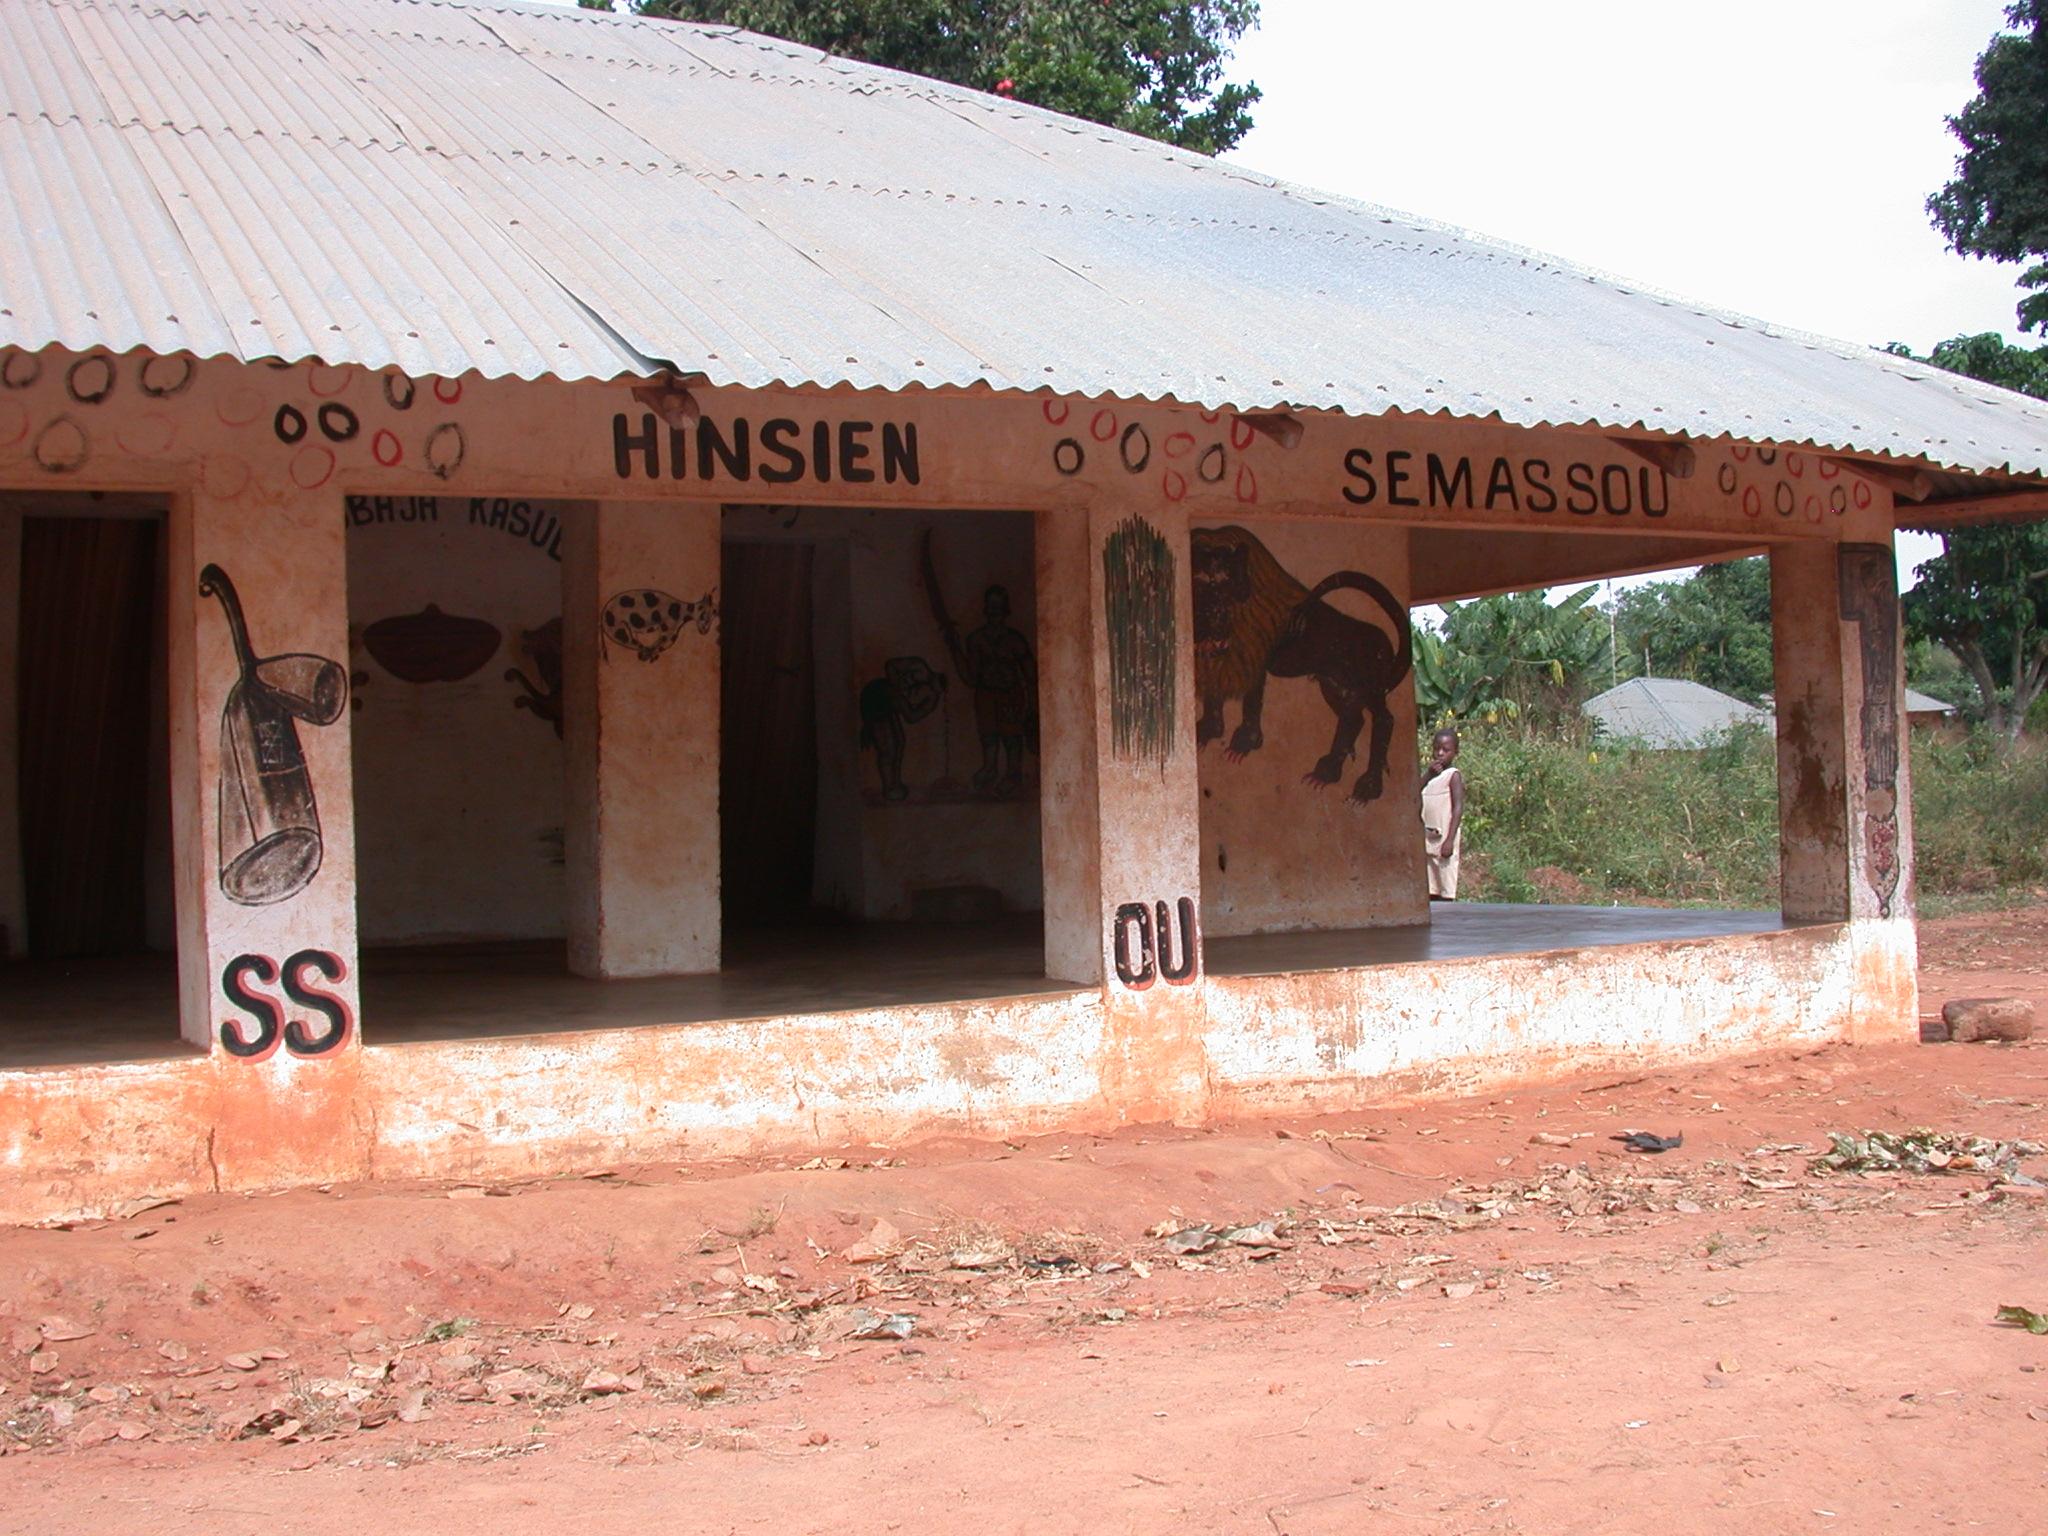 Semassou Glele Temple, Abomey, Benin